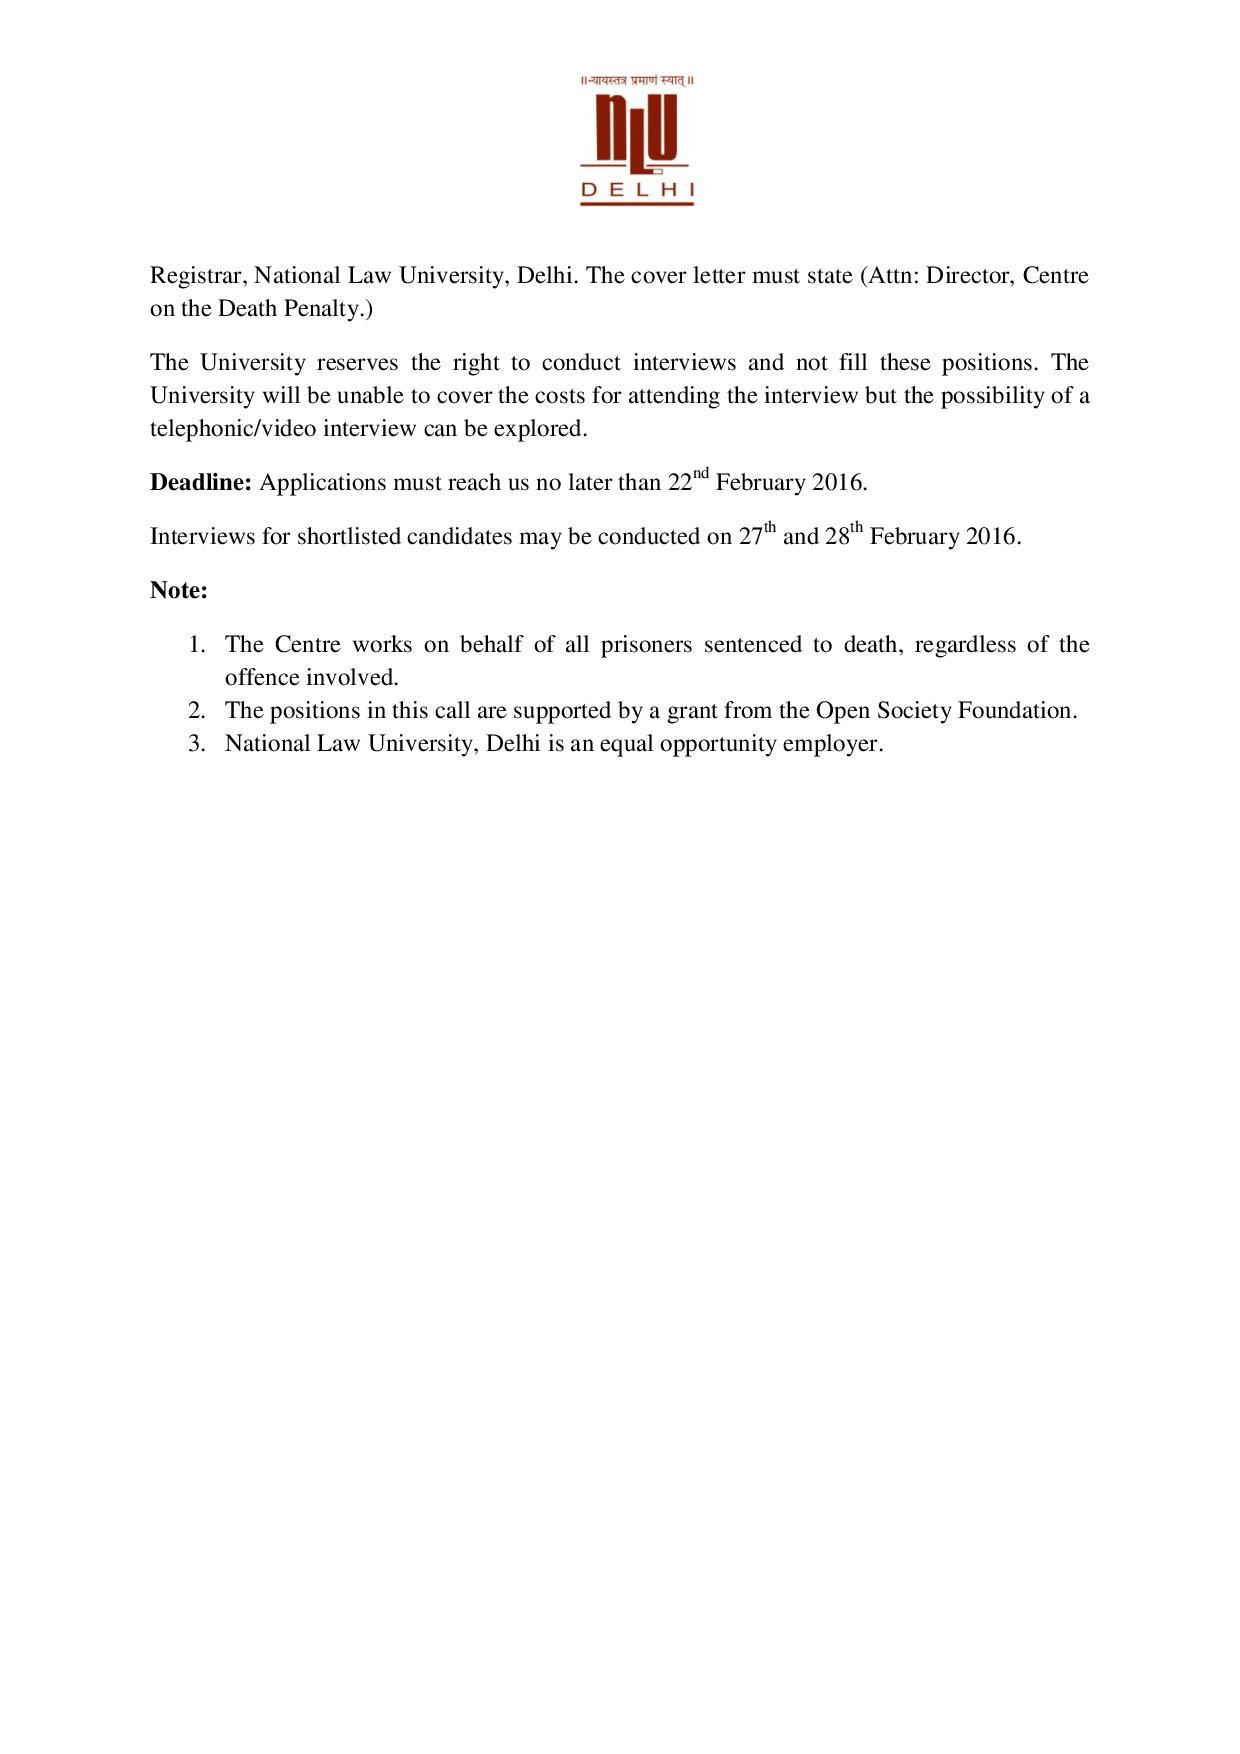 NLU Delhi JOB POST-page-003